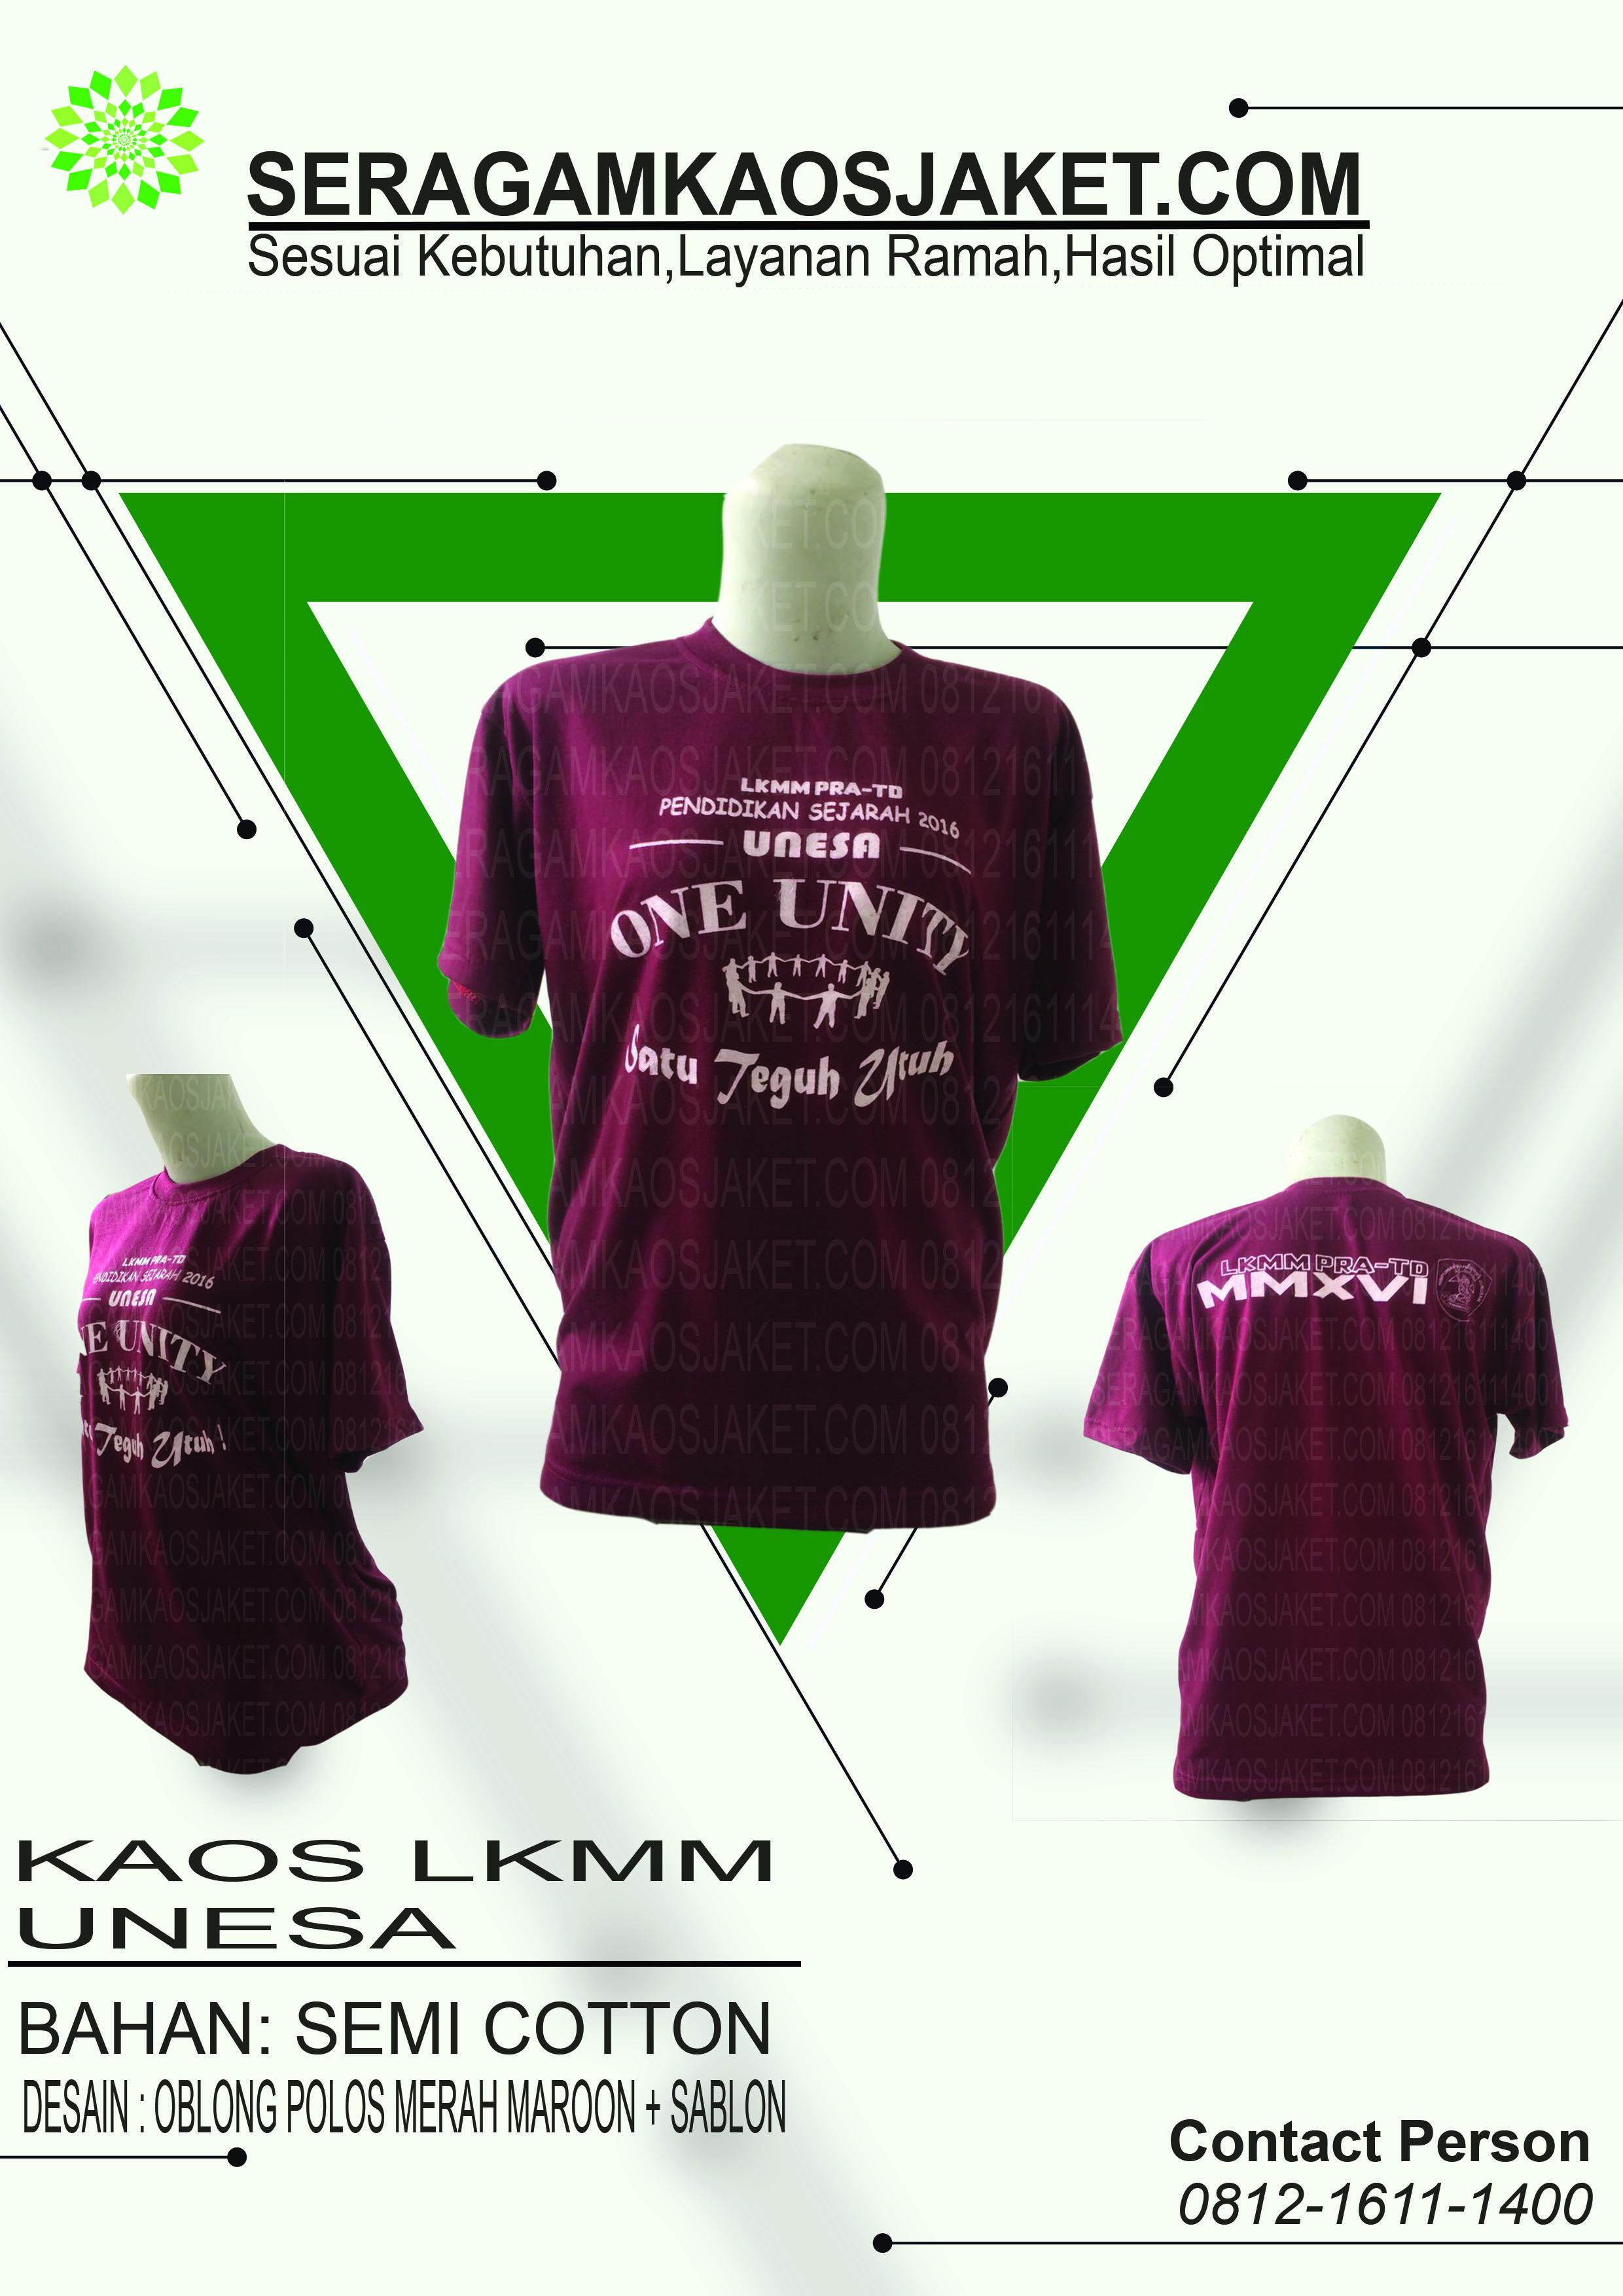 Desain Kaos Study Tour : desain, study, Study, Surabaya, 081216111400, SERAGAMKAOSJAKET.COM, Semua.., Kalian, Bingung, Mana…, Surabaya,, Kaos,, Pesan